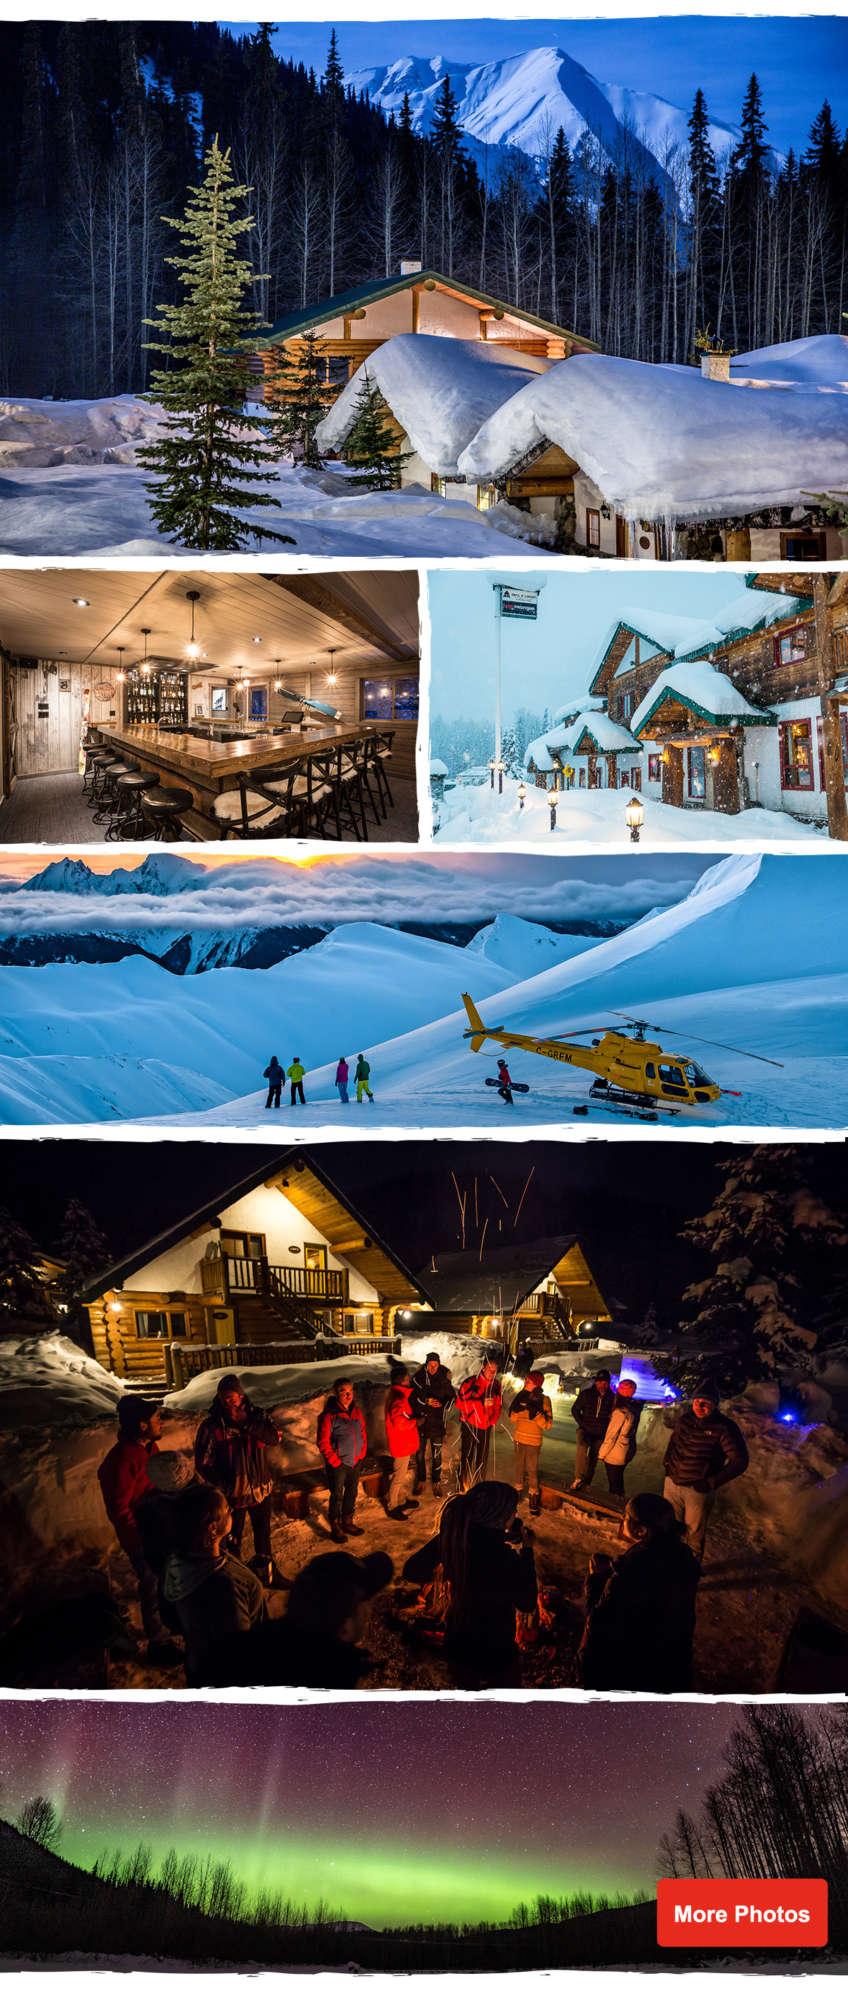 Heliski Village in BC Canada Heli Skiing Lodging